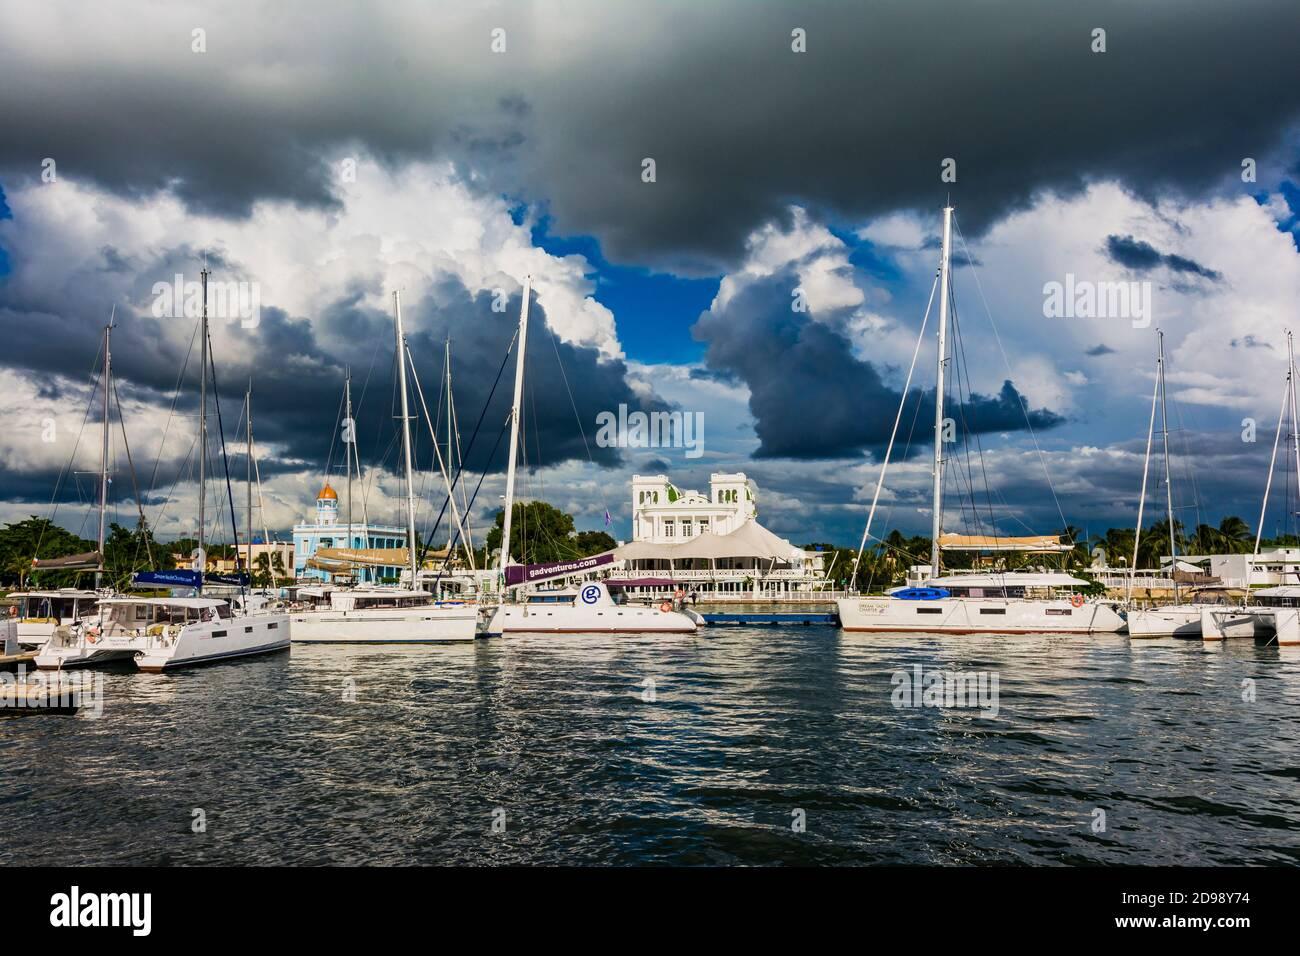 Cienfuegos Yachting Club et marina. Cienfuegos, Cuba, Amérique latine et Caraïbes Banque D'Images